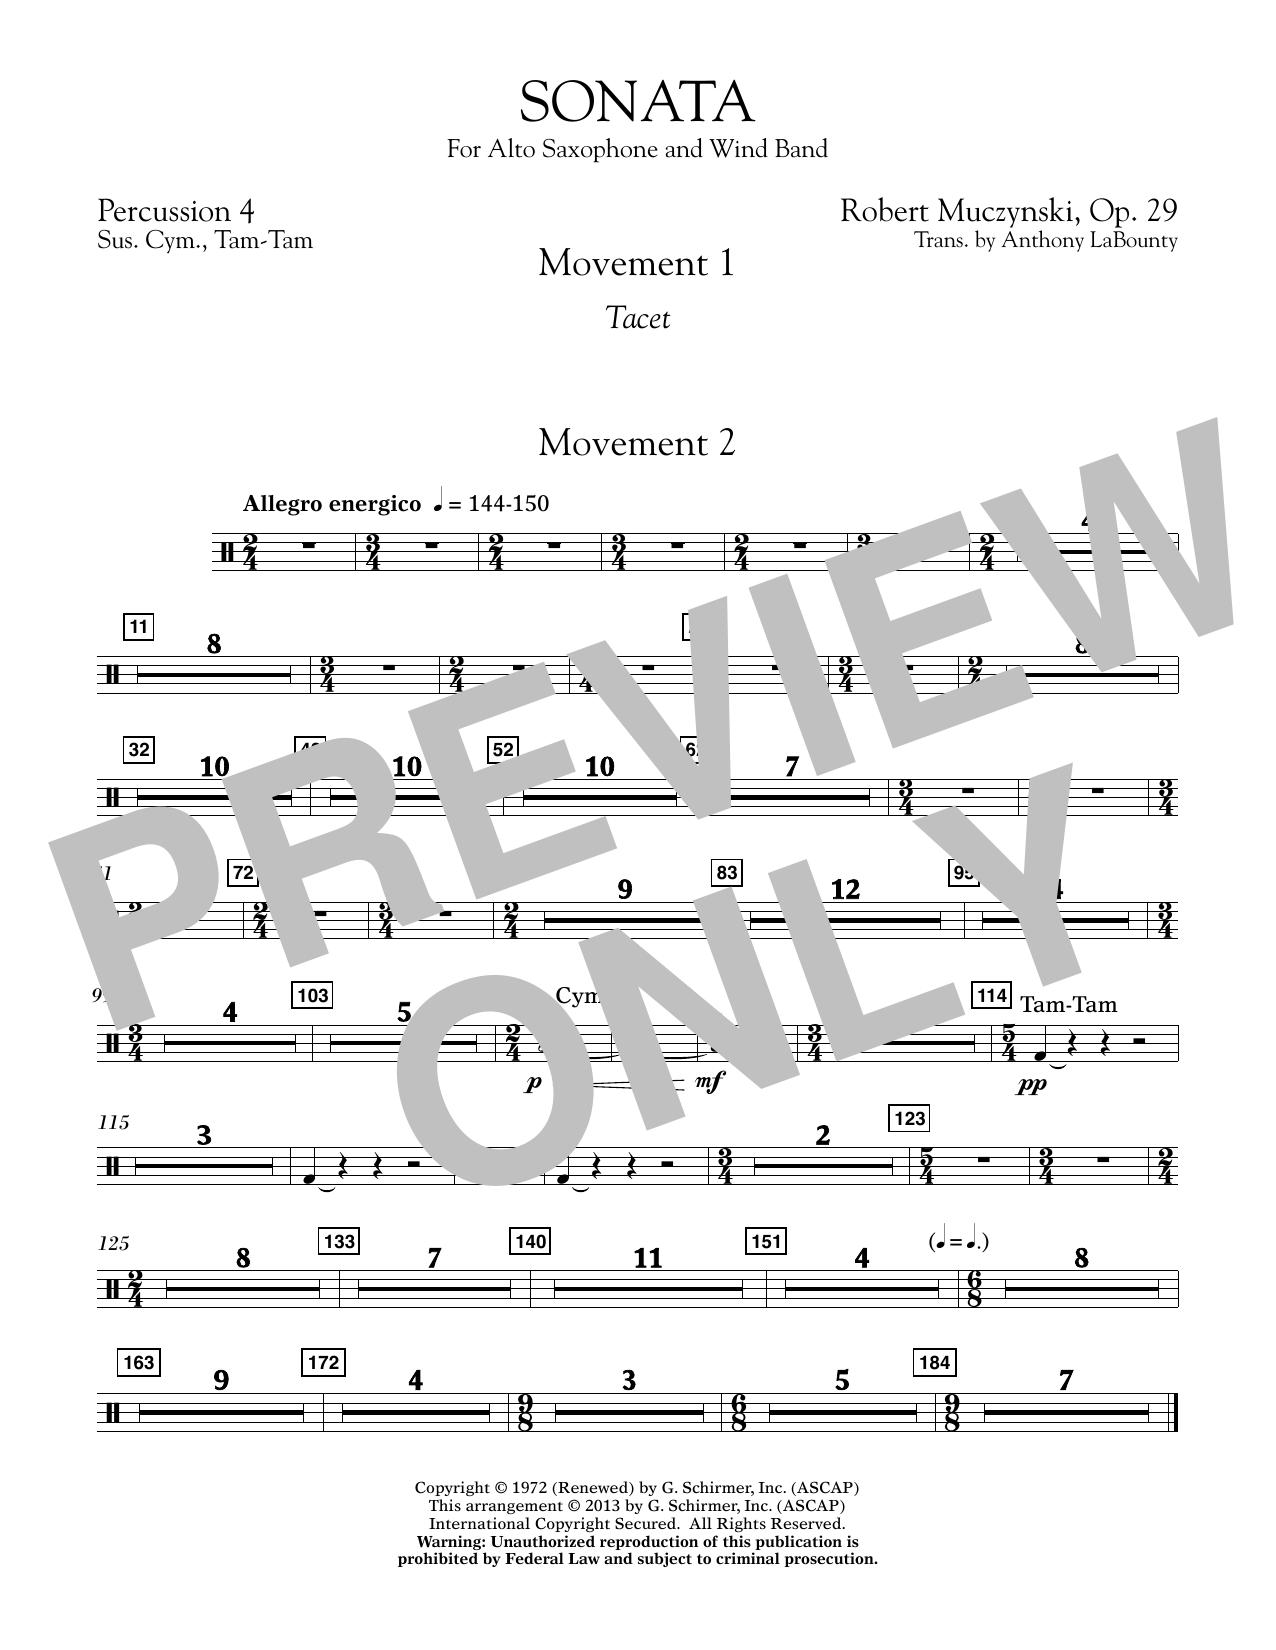 Sonata for Alto Saxophone, Op. 29 - Percussion 4 (Concert Band)